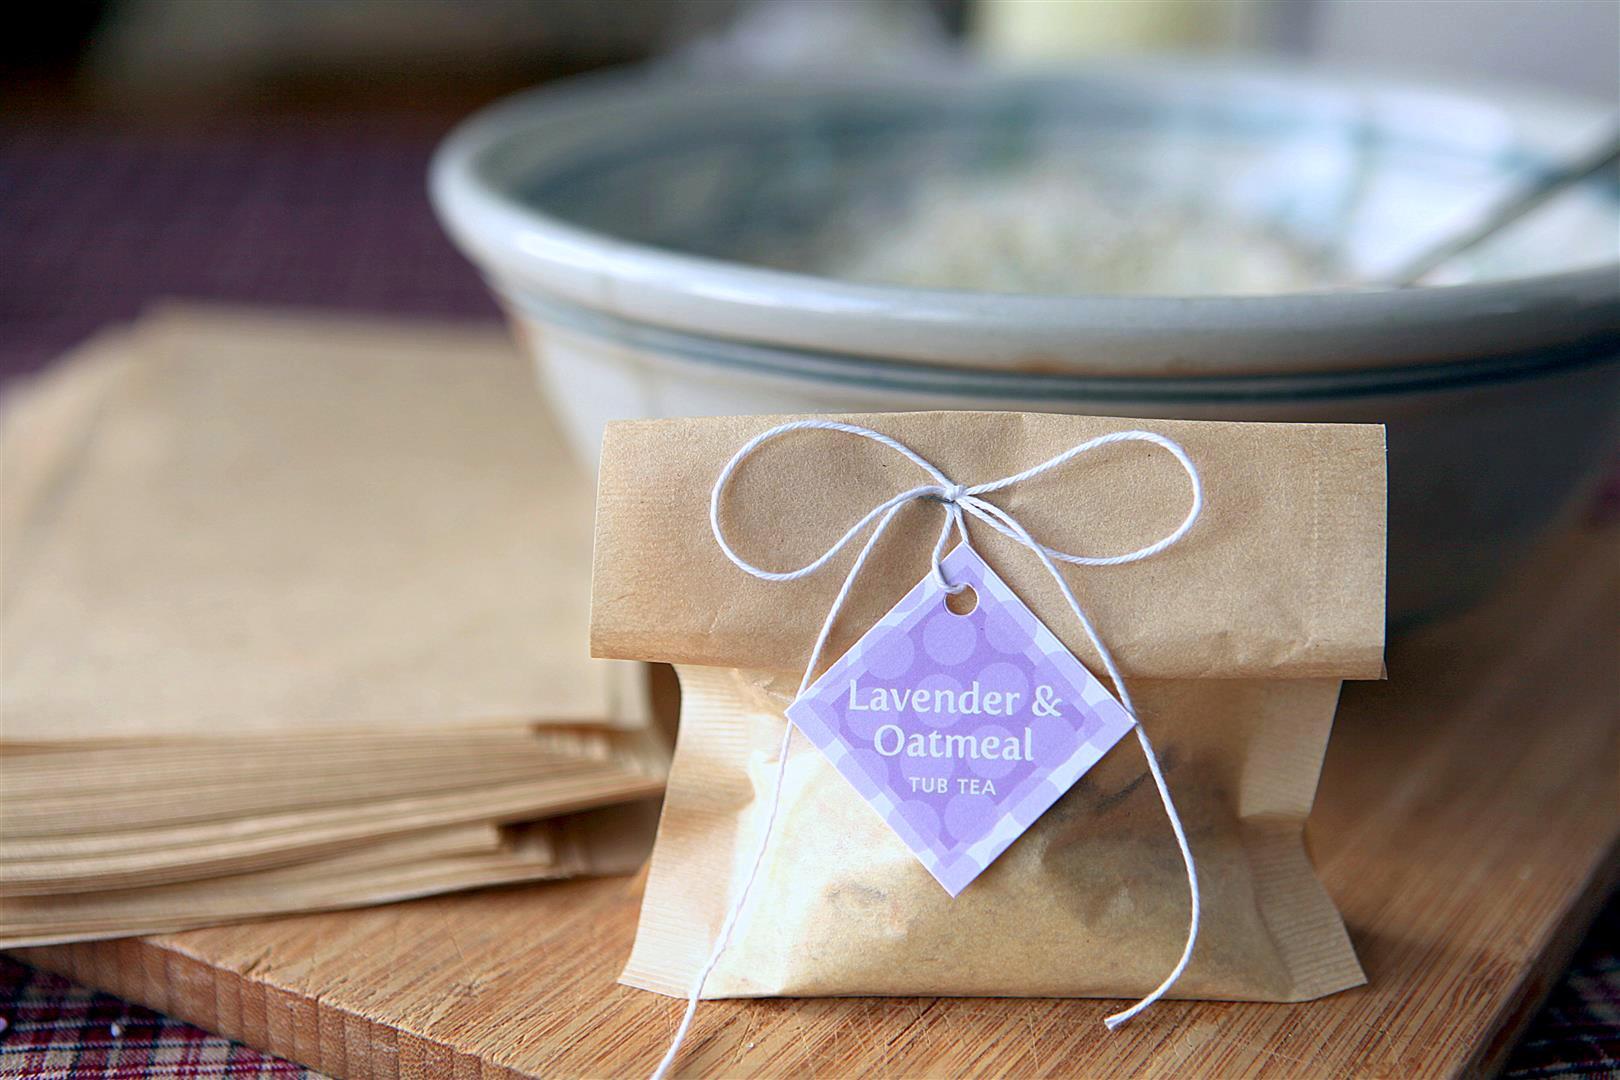 Lavender Oatmeal Tub Tea